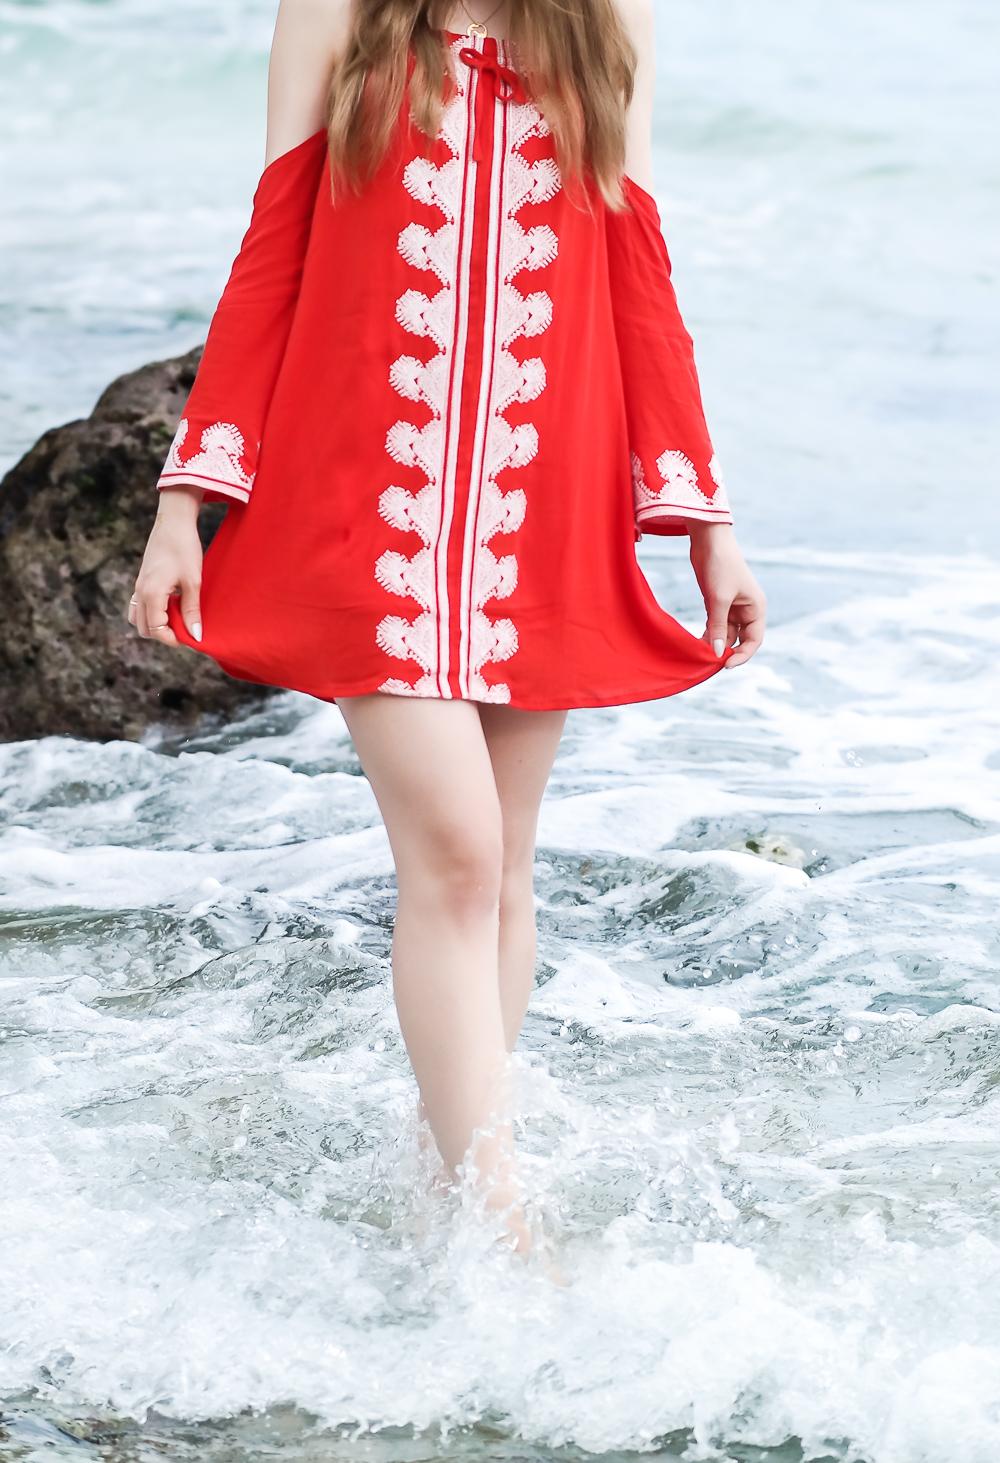 TheRubinRose-The Rubin Rose-Modeblog-München-Fashionblog-Munich-Modeblogger-Fashionblogger-Germany-Deutschland-Red Dress-Rotes Kleid-Asien-Asia Style-Cut-Outs-Glockenärmel-Flash Tattoos-Padang Padang-Beach-Strand-Bali-Uluwatu